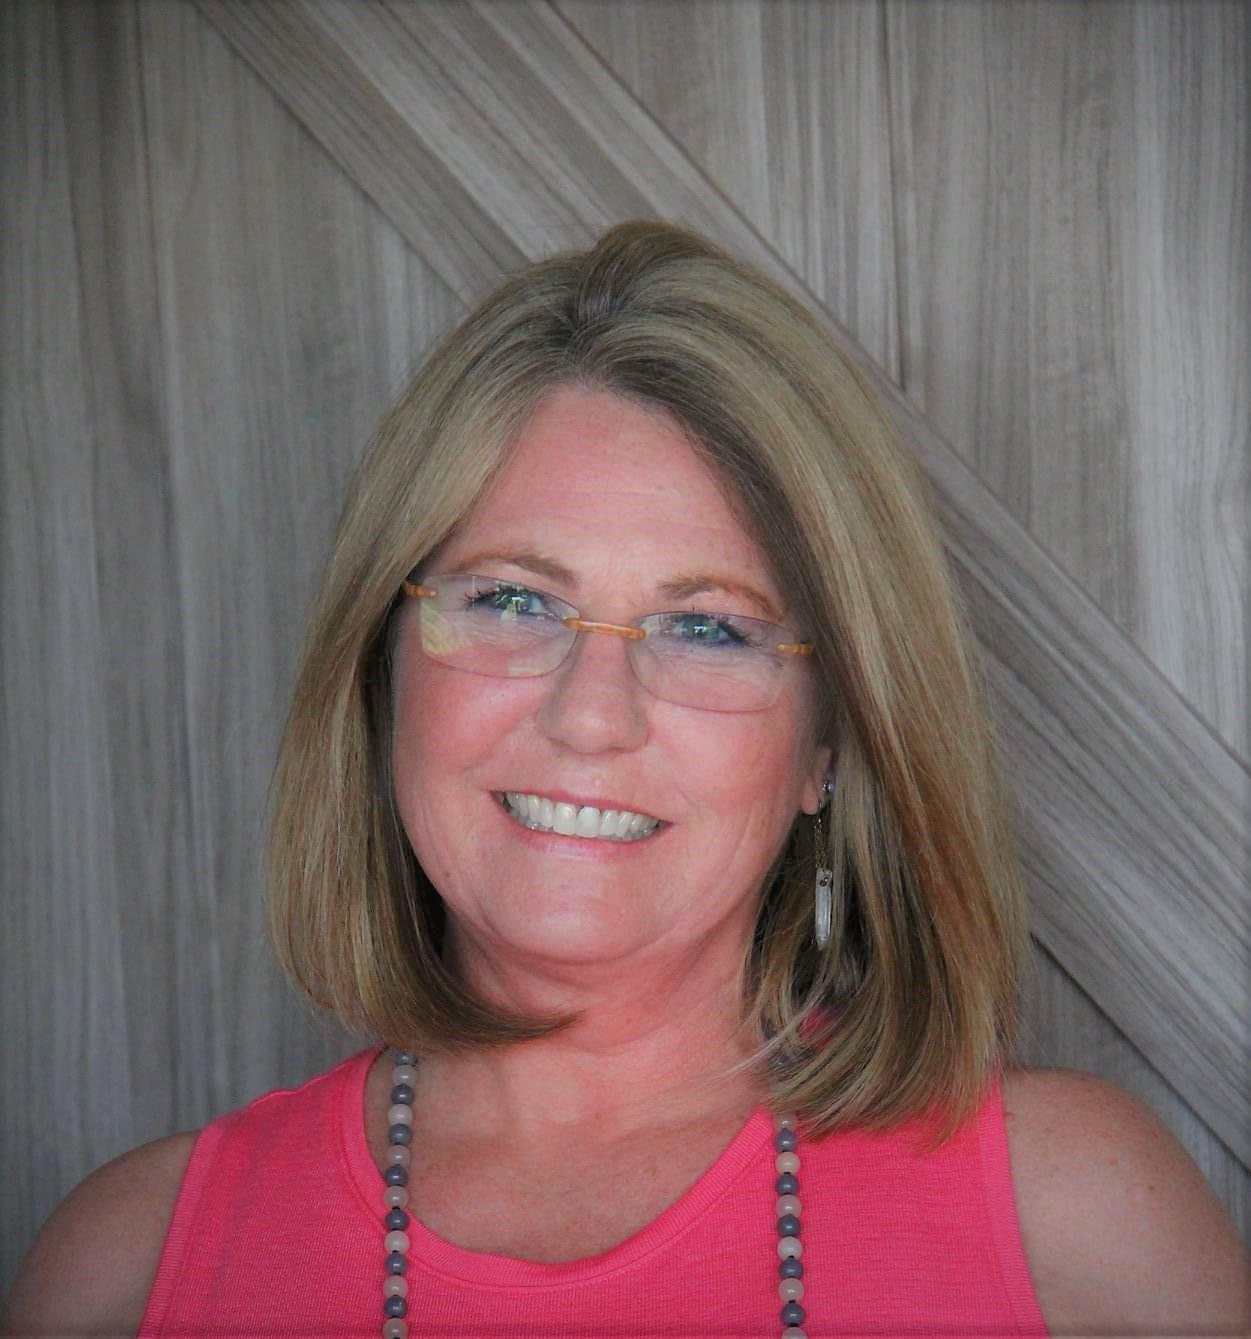 Teri Cartwright